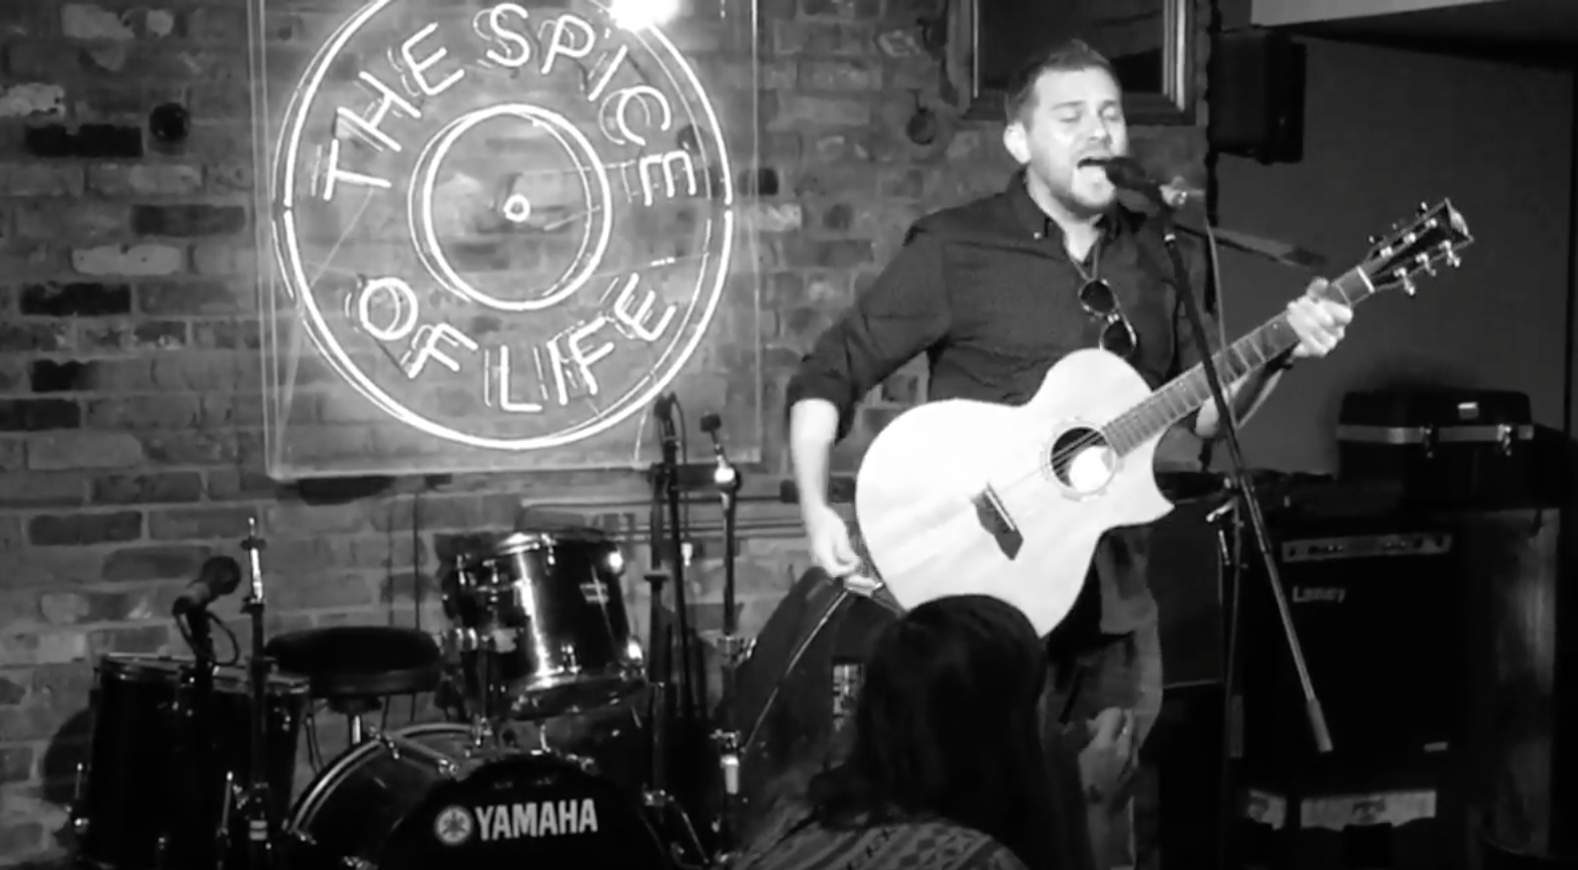 Sean Benjamin performing at The Spice of Life in Soho, London, UK, on 10 June 2017.